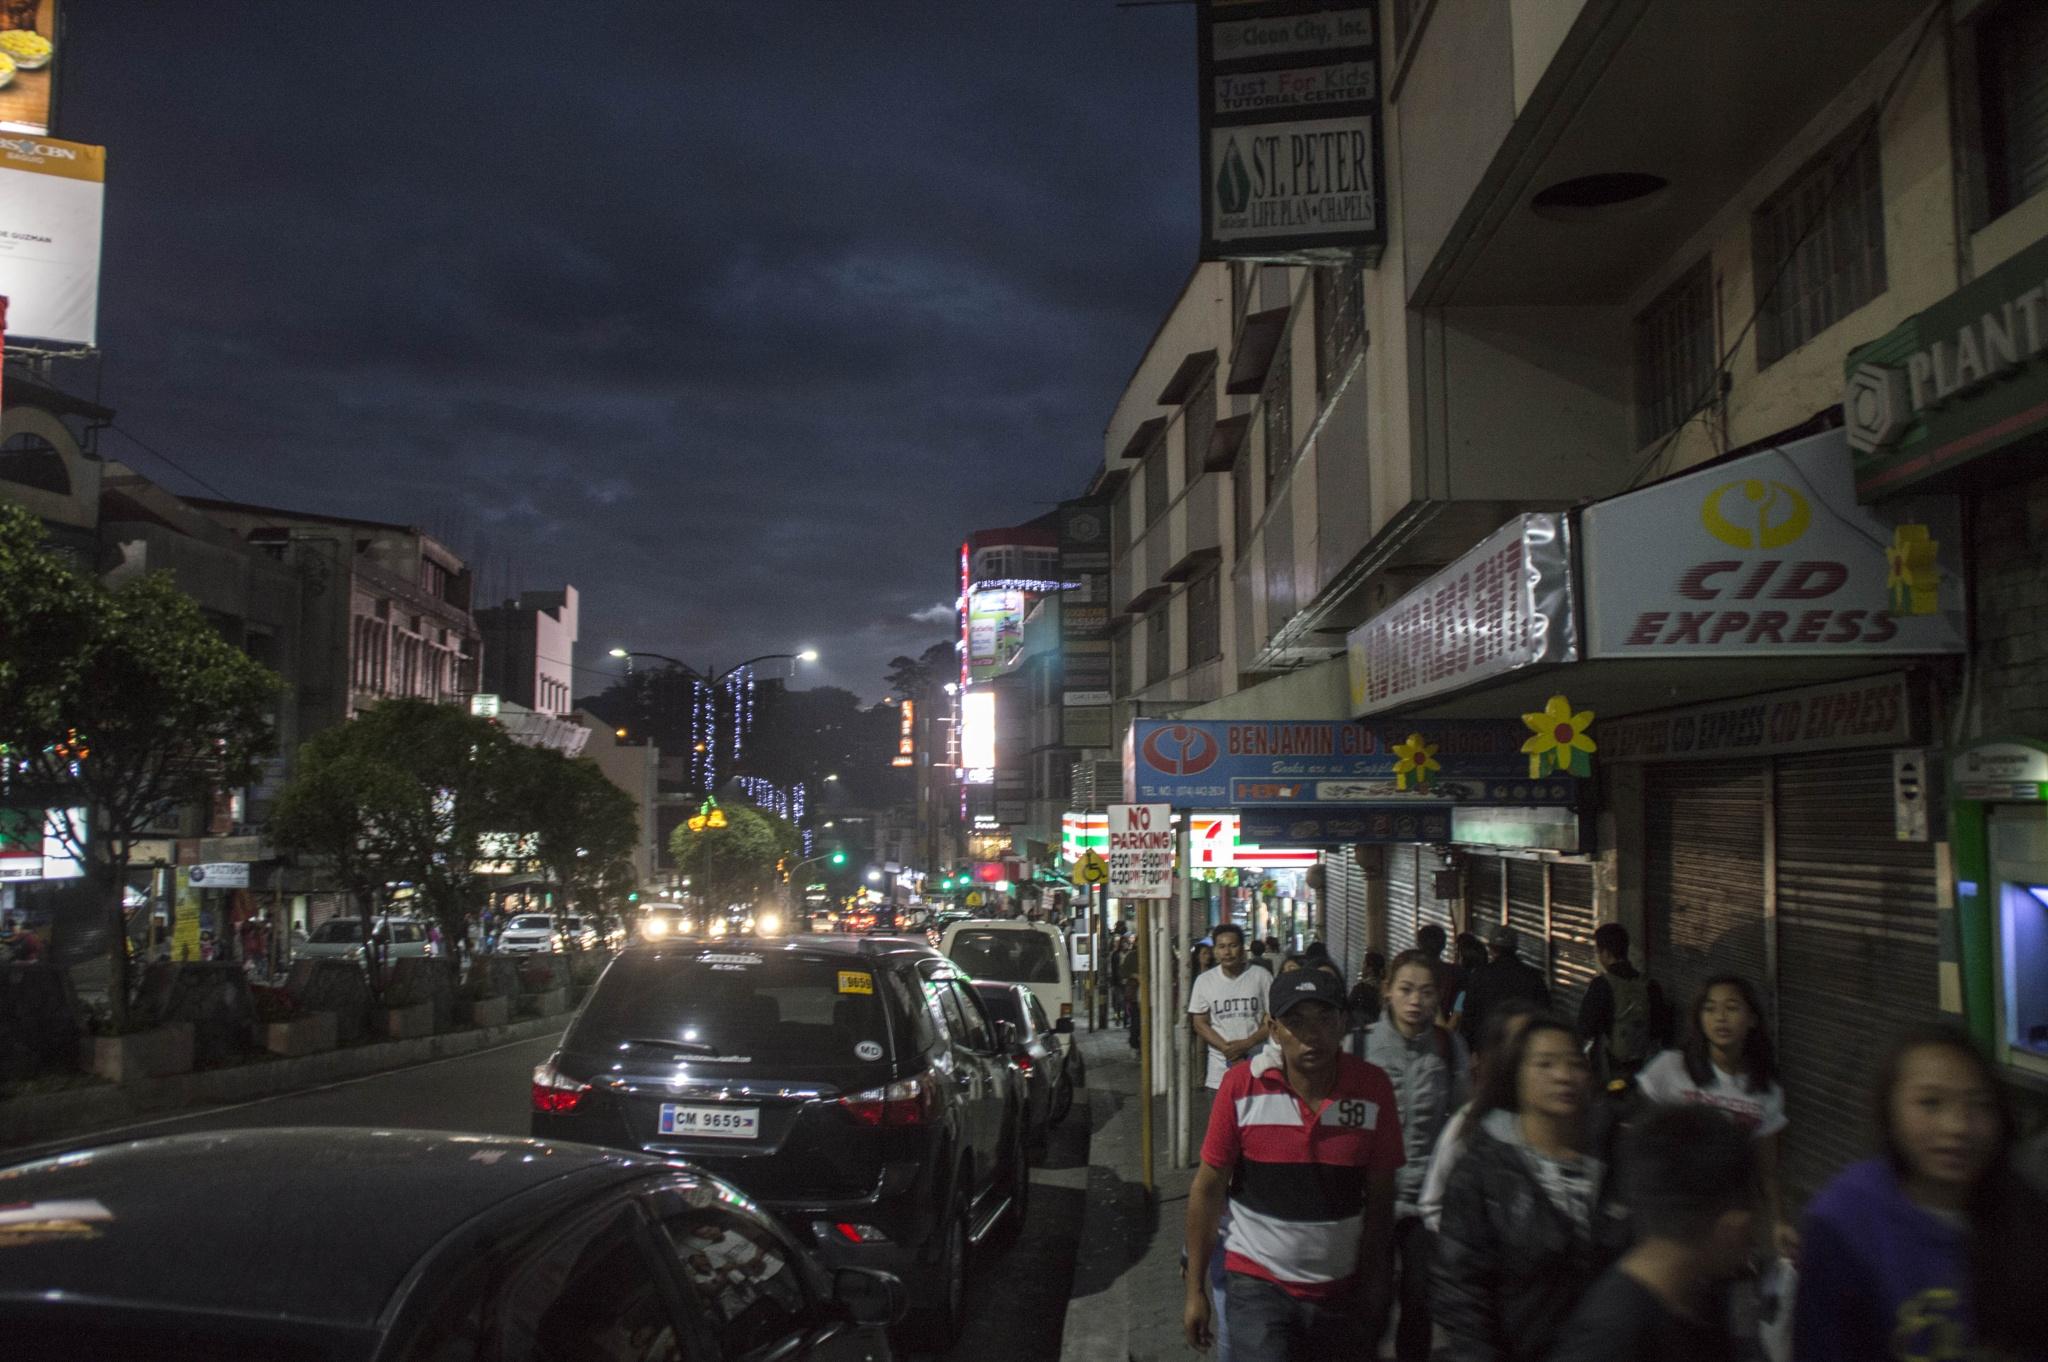 town at night by BearMan